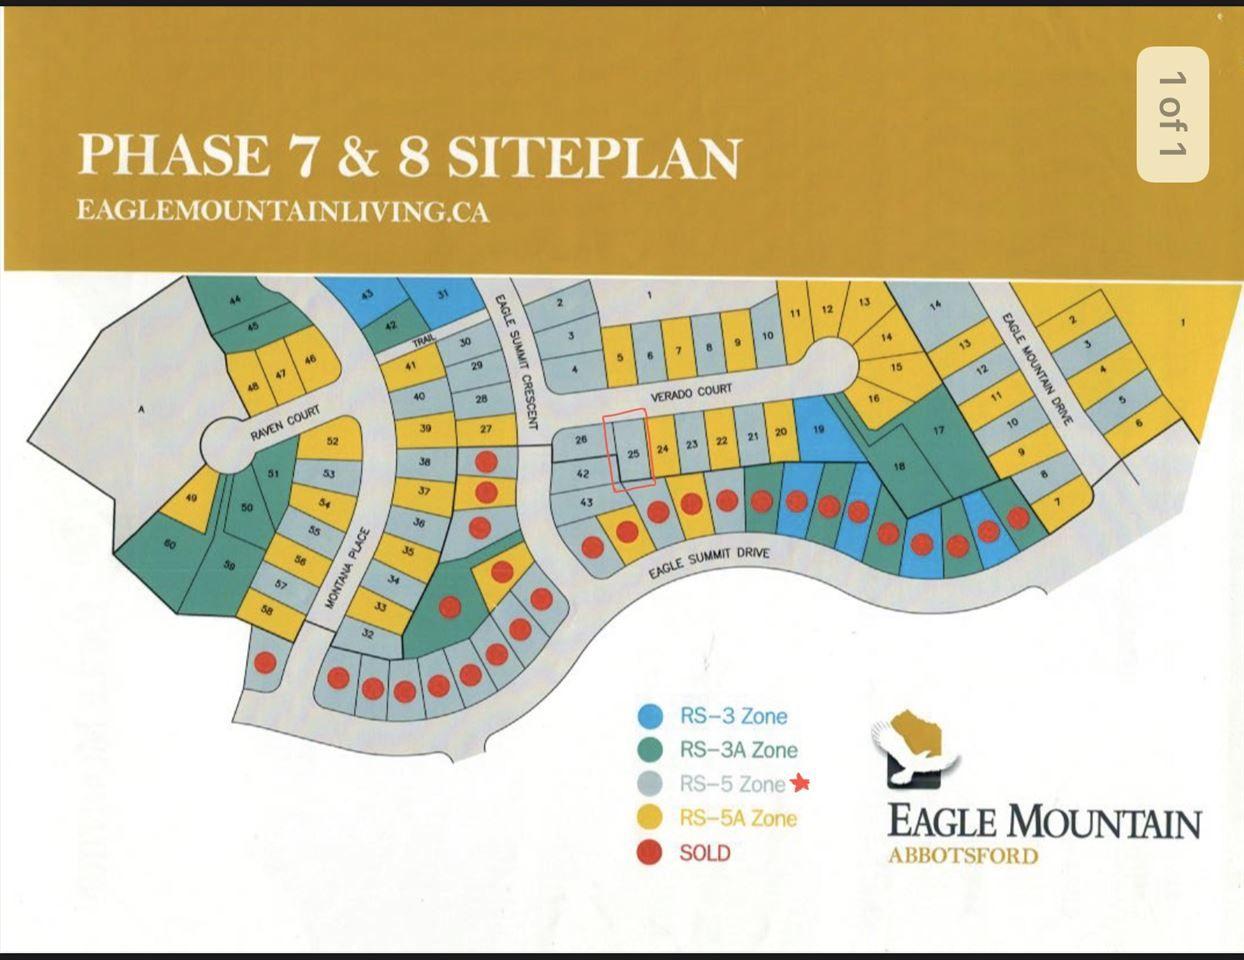 Main Photo: 35432 VERADO Court in Abbotsford: Abbotsford East Land for sale : MLS®# R2515226